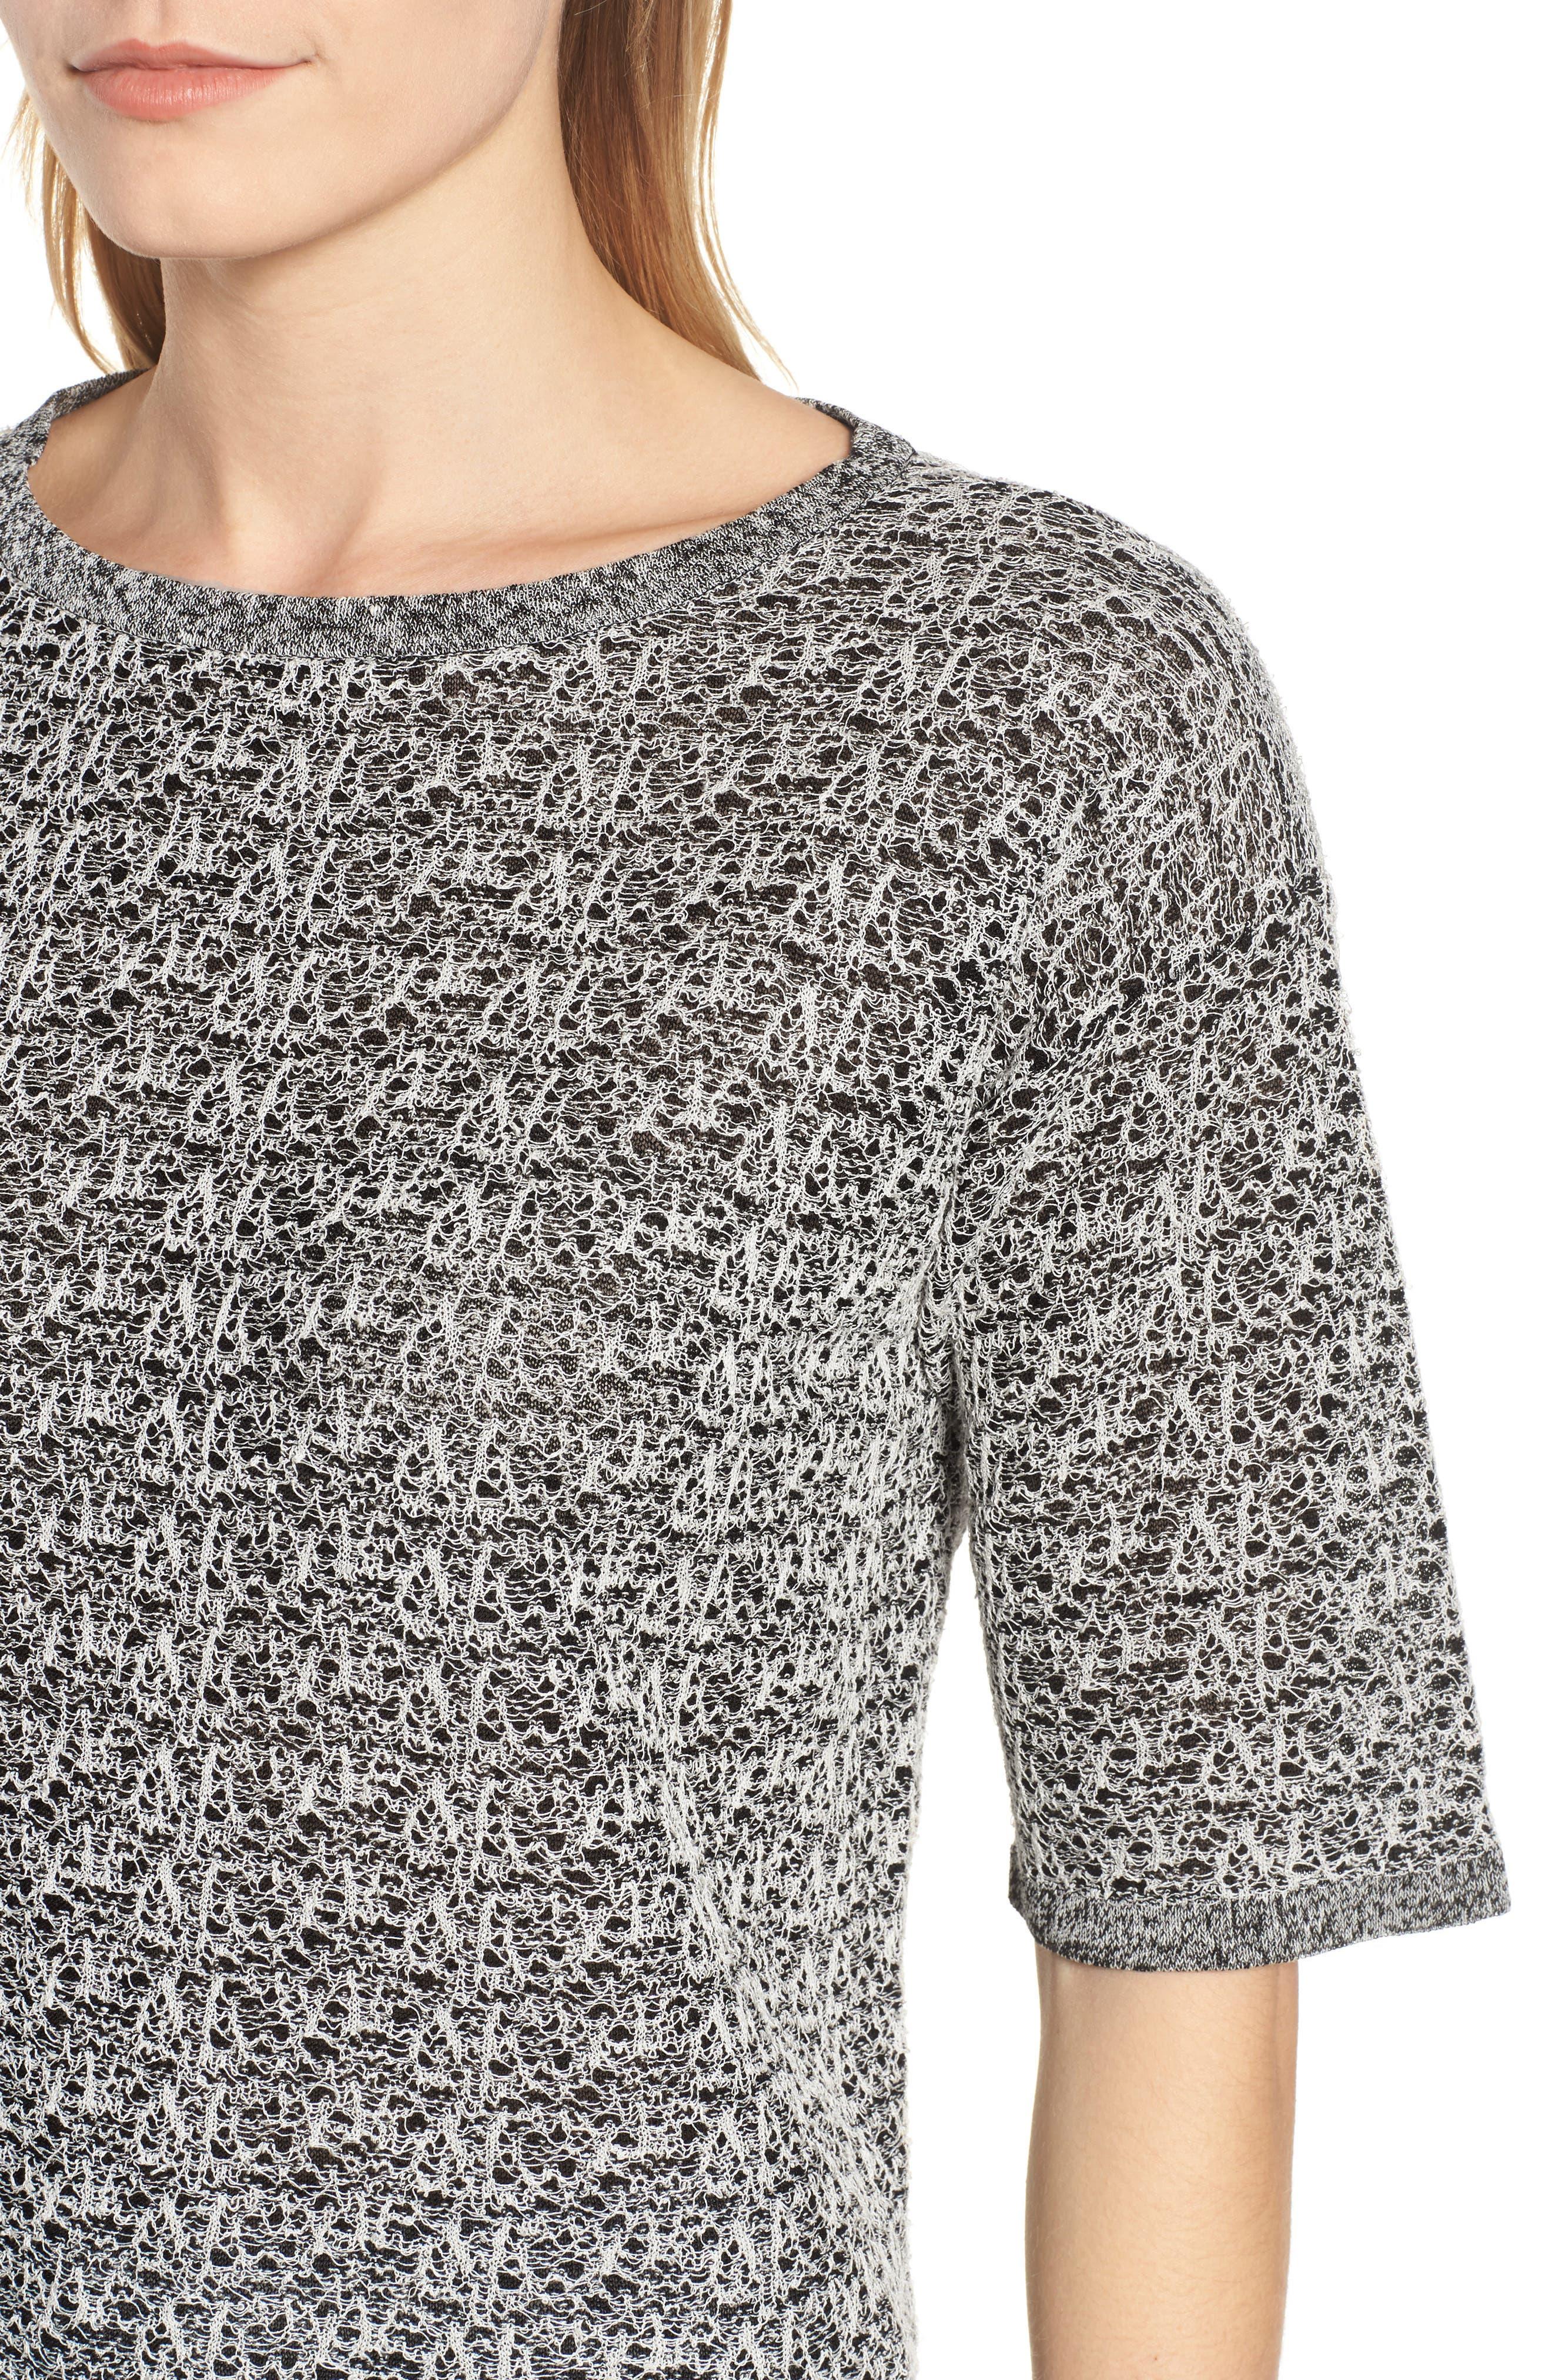 Organic Linen Blend Knit Top,                             Alternate thumbnail 4, color,